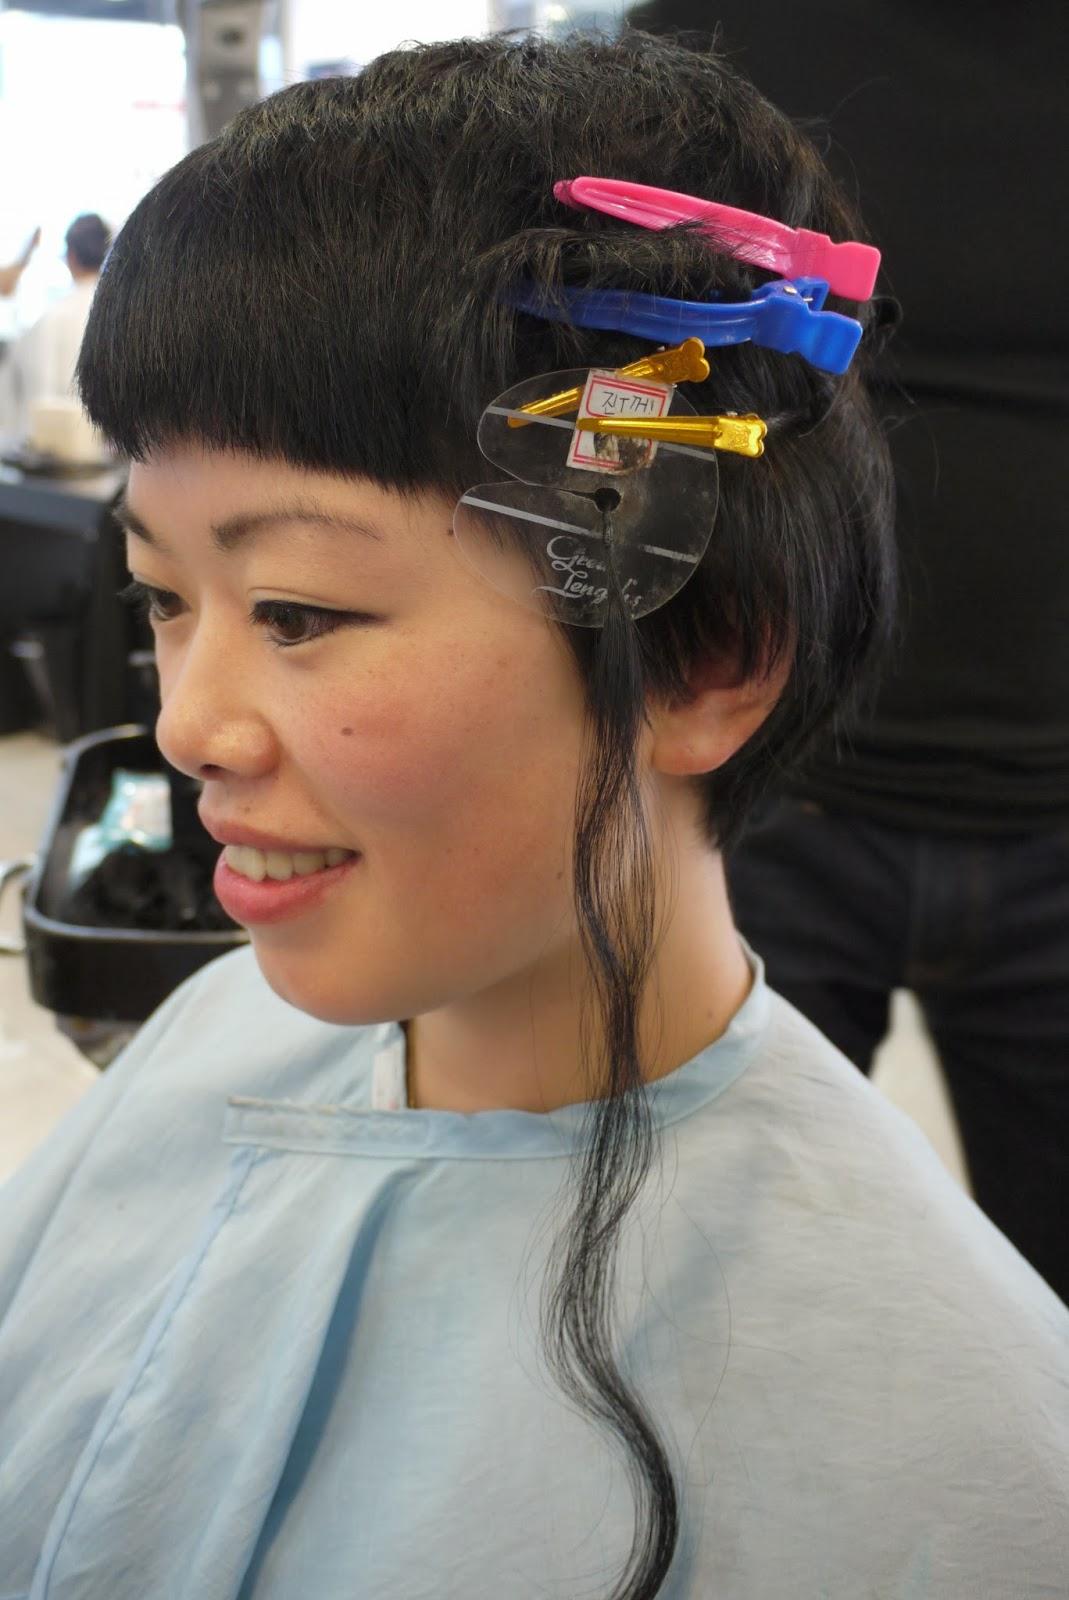 Black Hair Dye And Keratin Hair Extensions Suins Hair Salon In